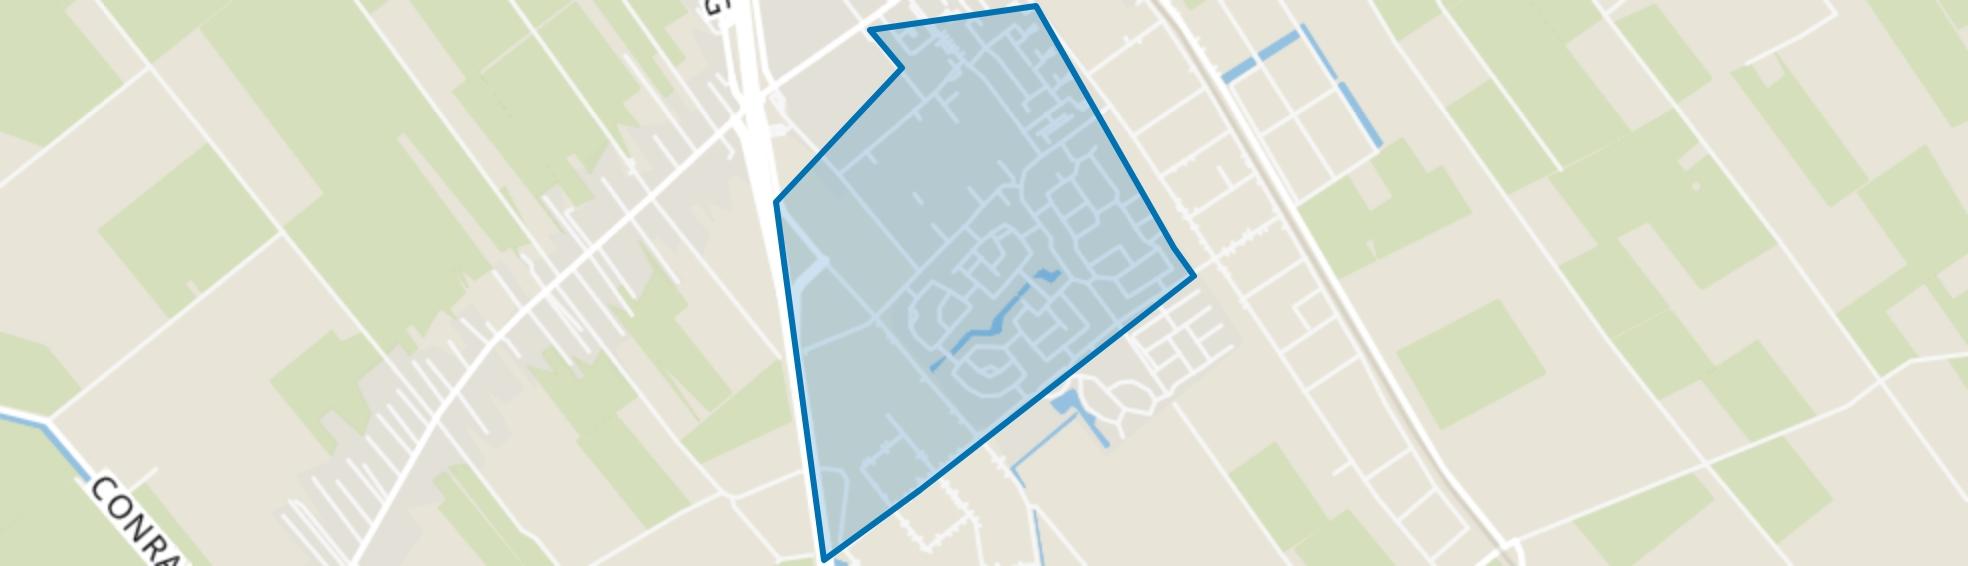 Staphorst-Zuid, Staphorst map